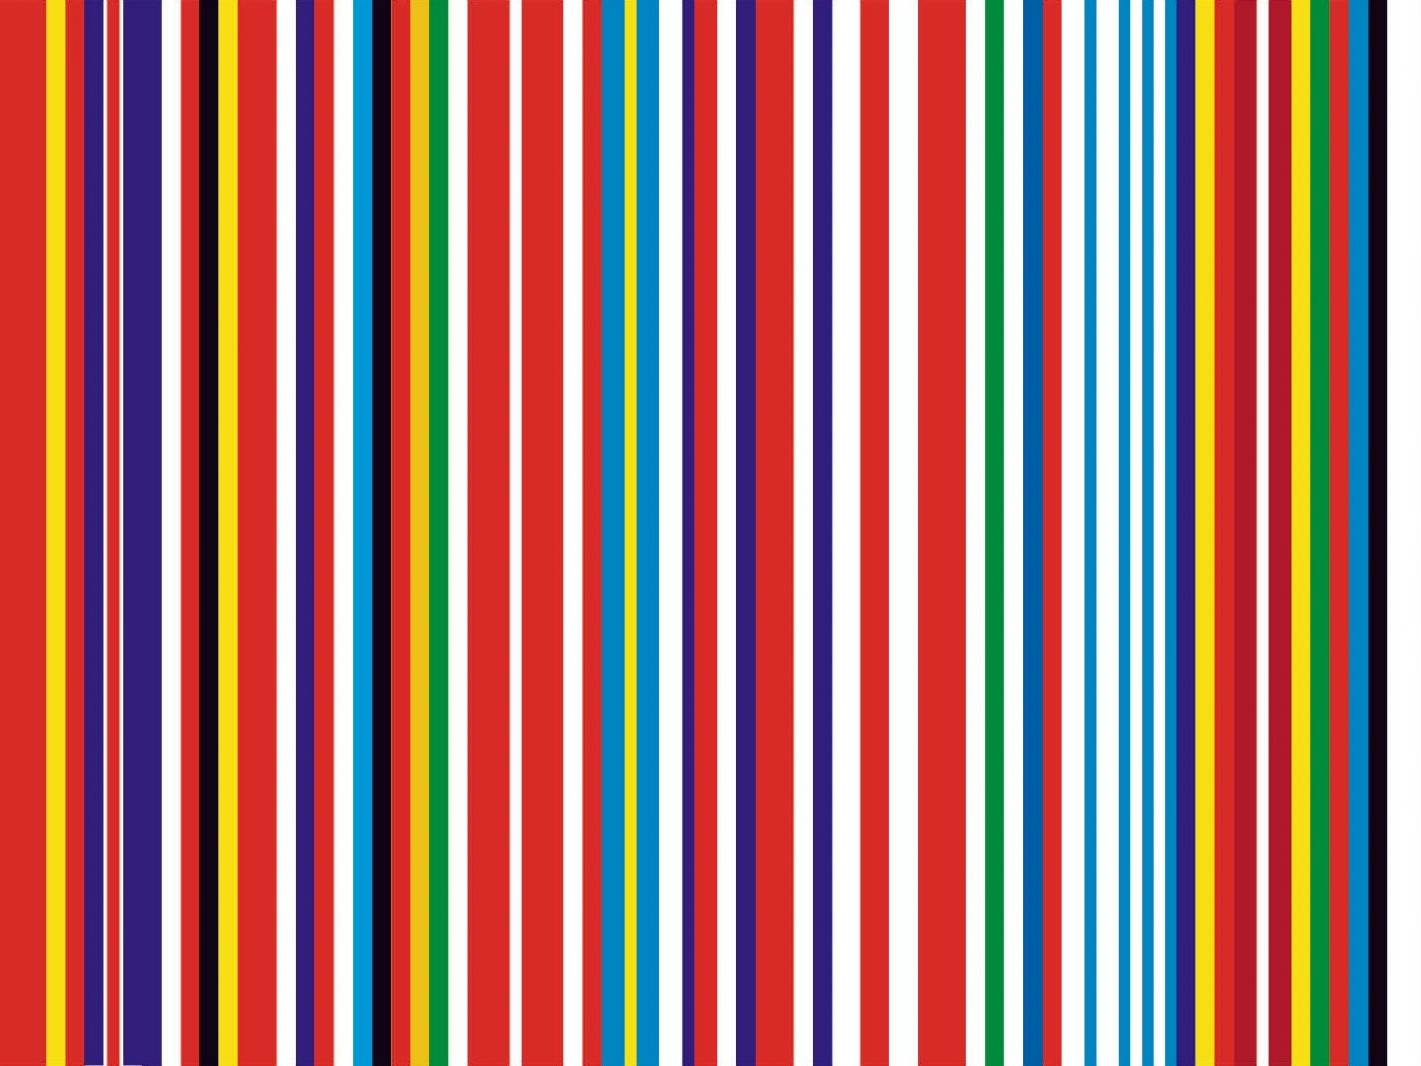 Europa-Barcode Foto: Rem Koolhaas (2001)